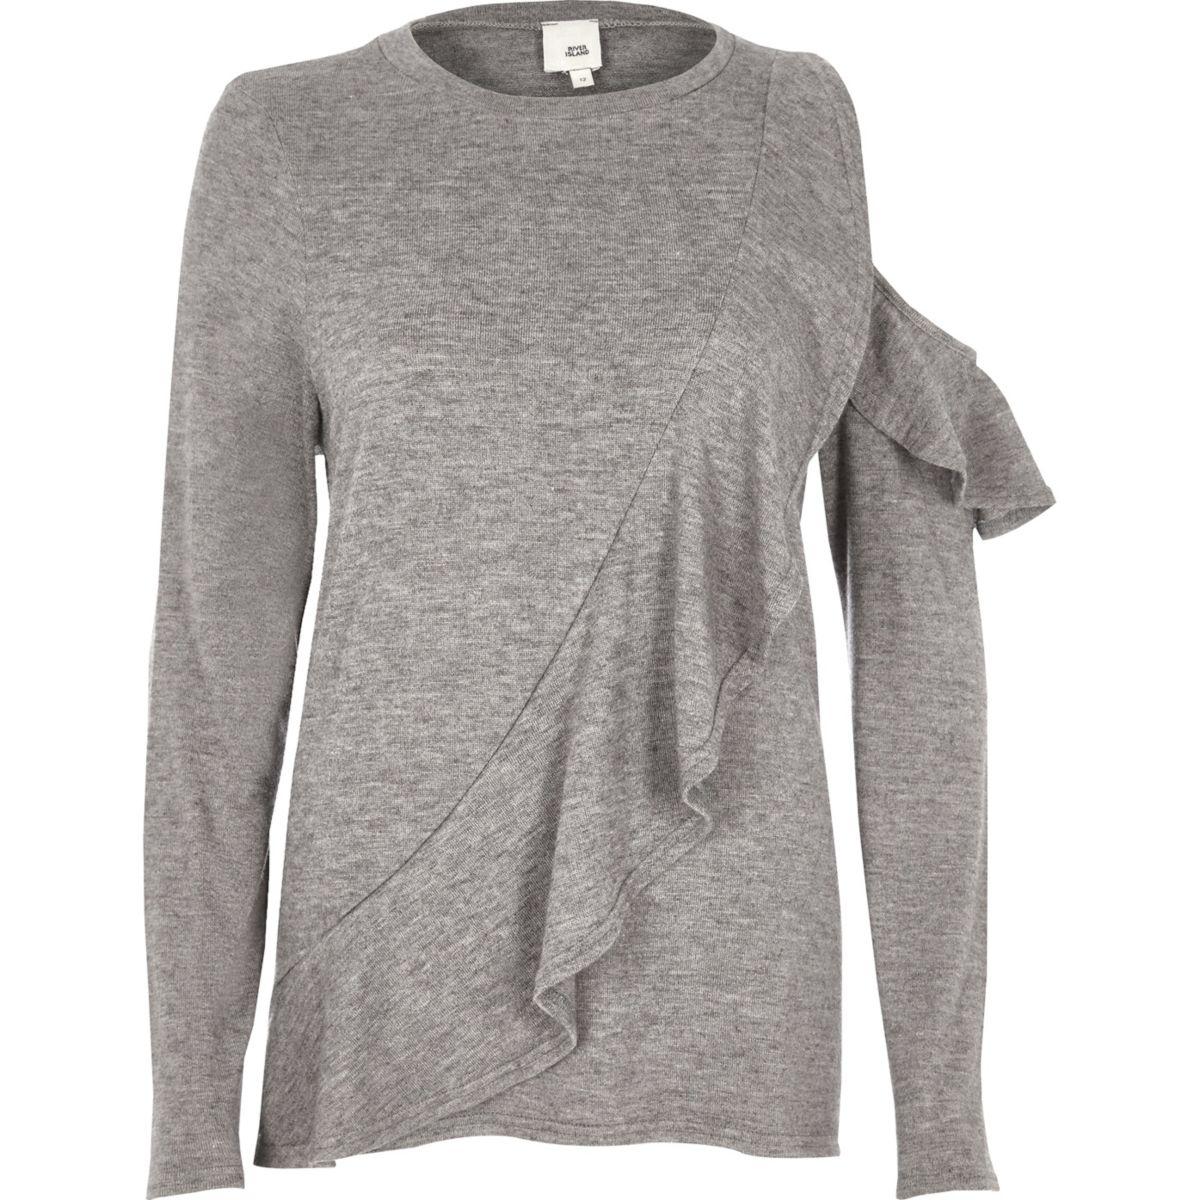 Grey frill front cut out shoulder jumper